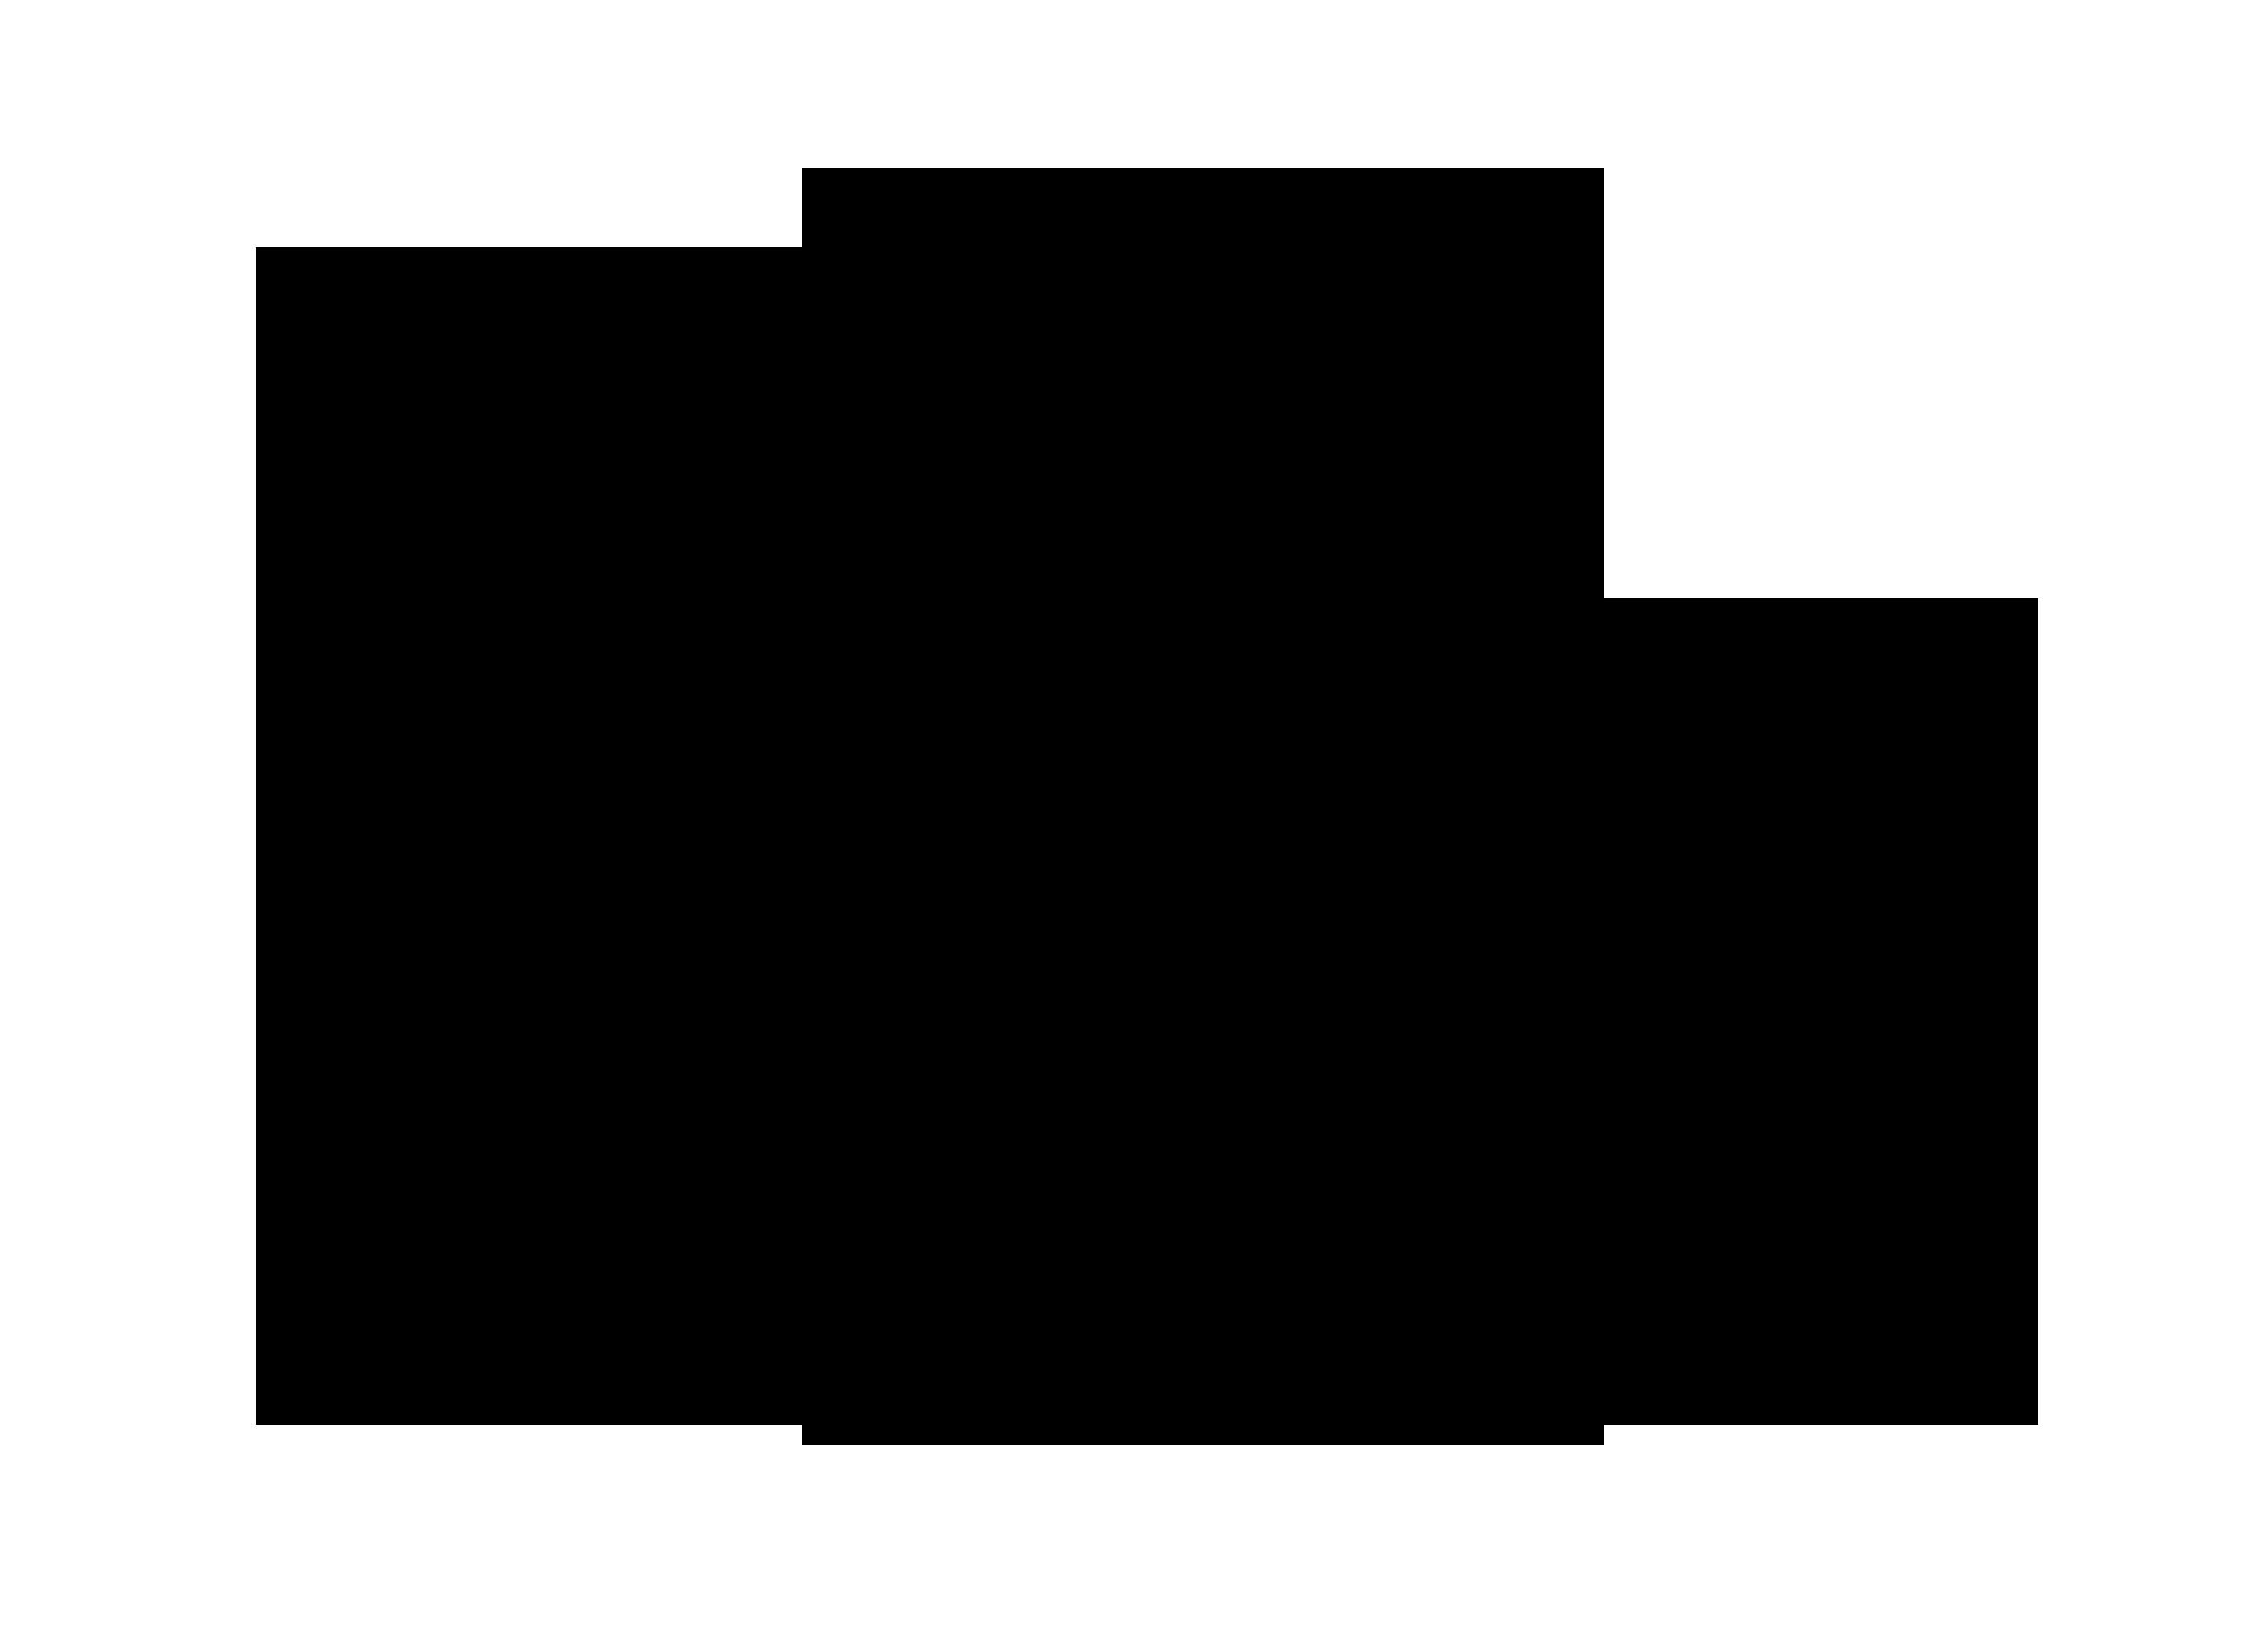 Bildergebnis für Queen Kerosin Logo